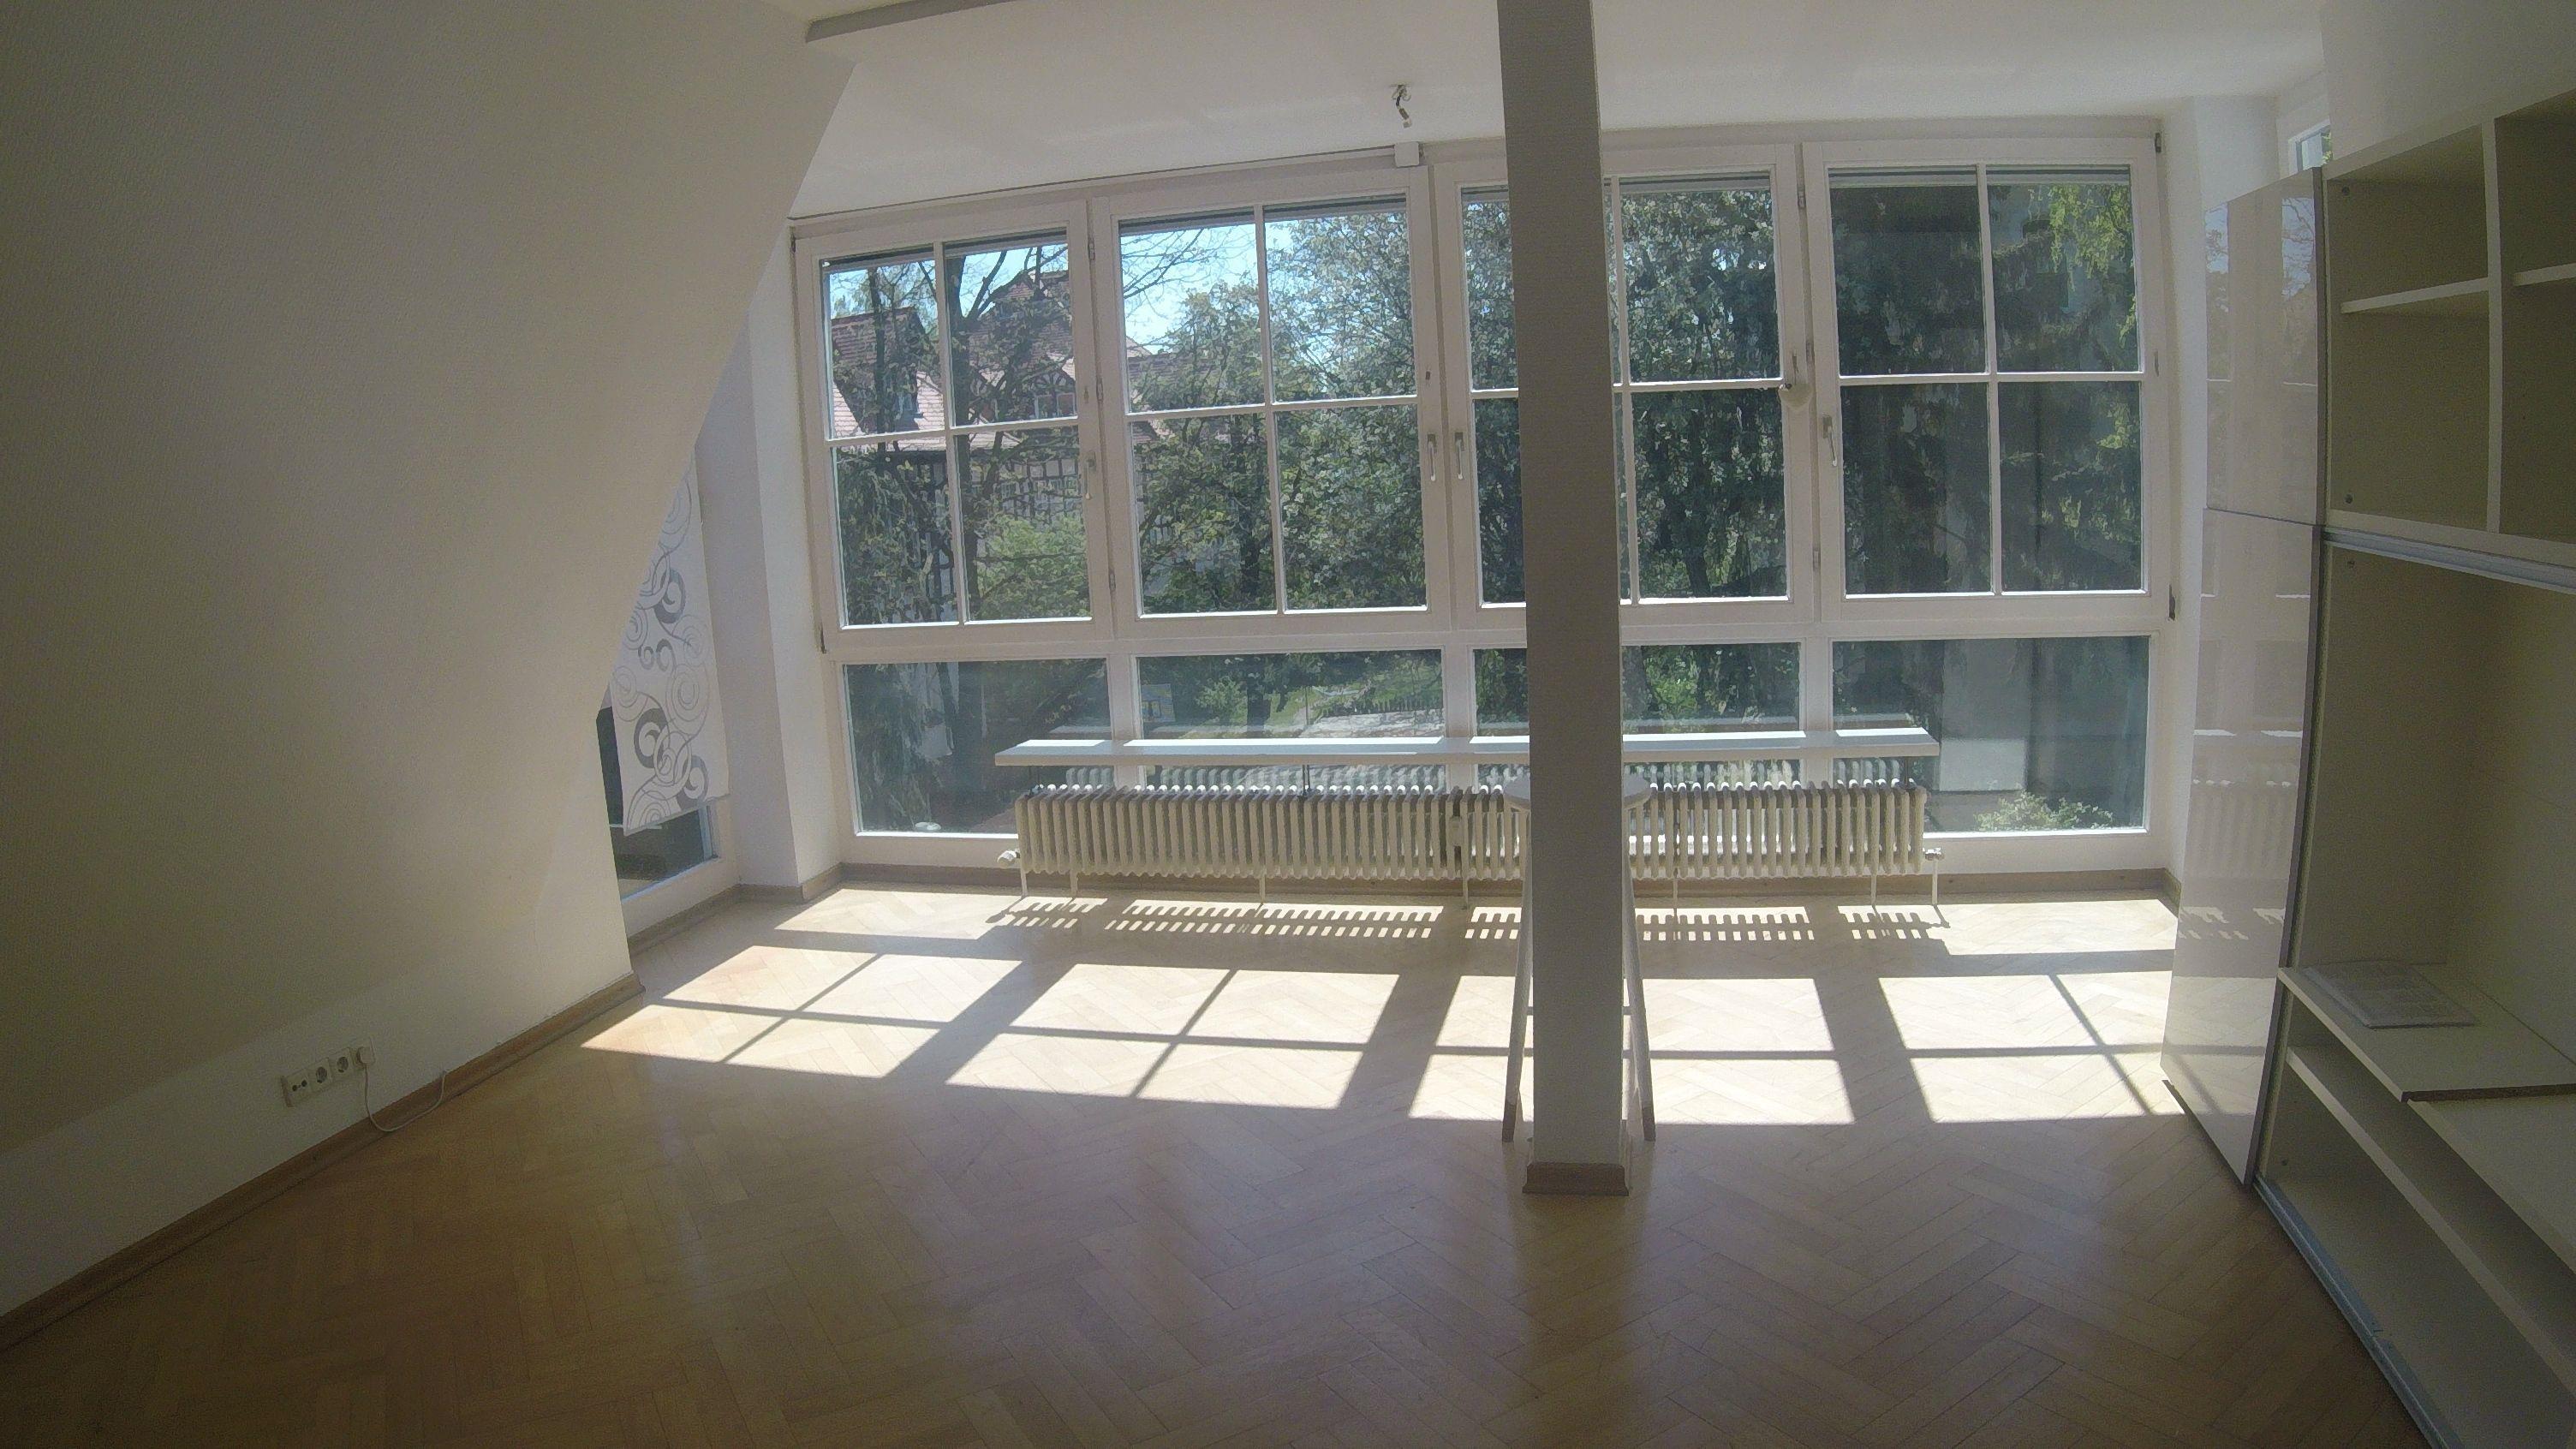 Dachgeschoss Wohnung 2 Zimmer In Berlin Lichterfelde Mit Wannenbad Parkettfussboden In 2020 Home Room Home Decor